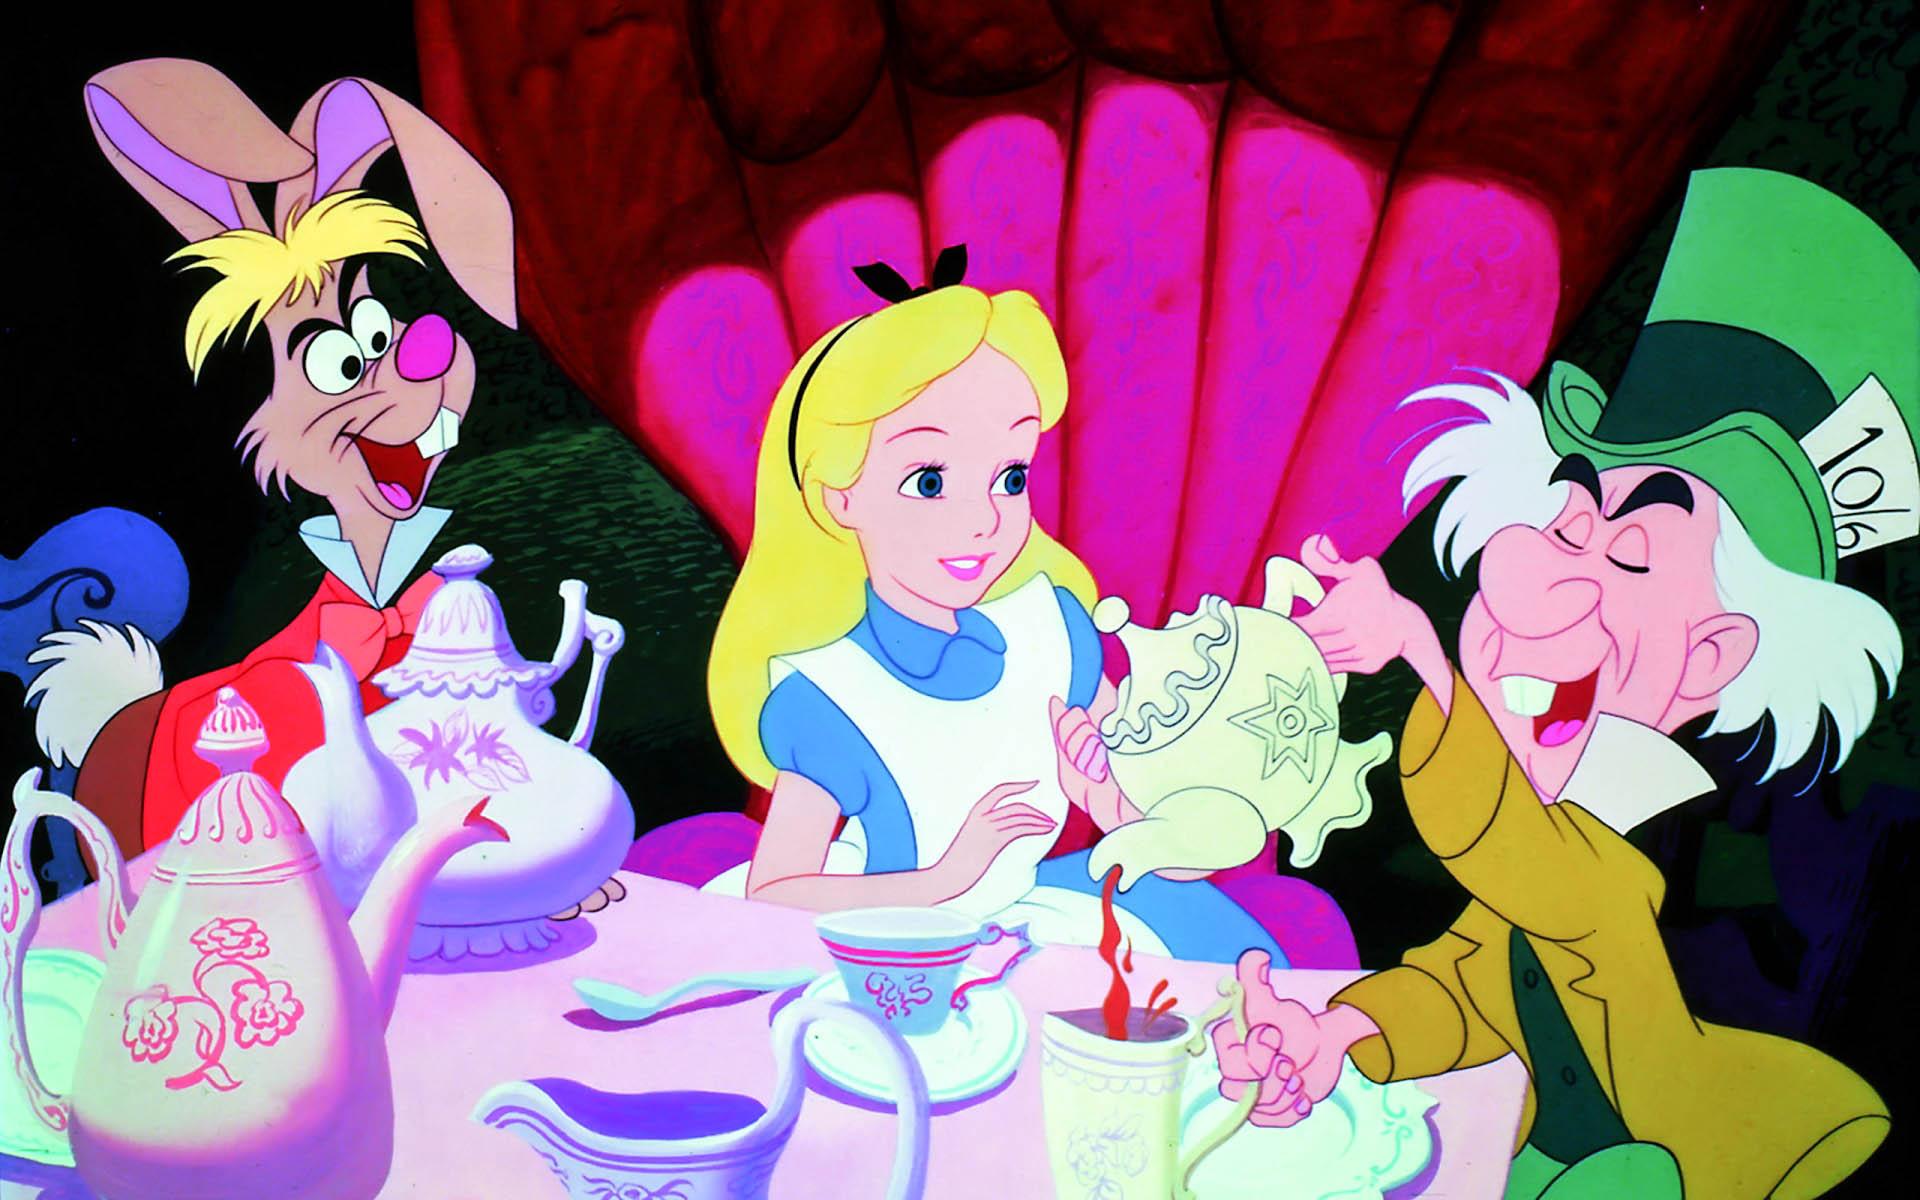 Alice In Wonderland Collage Hd Wallpaper Cartoon Animation 1920x1200